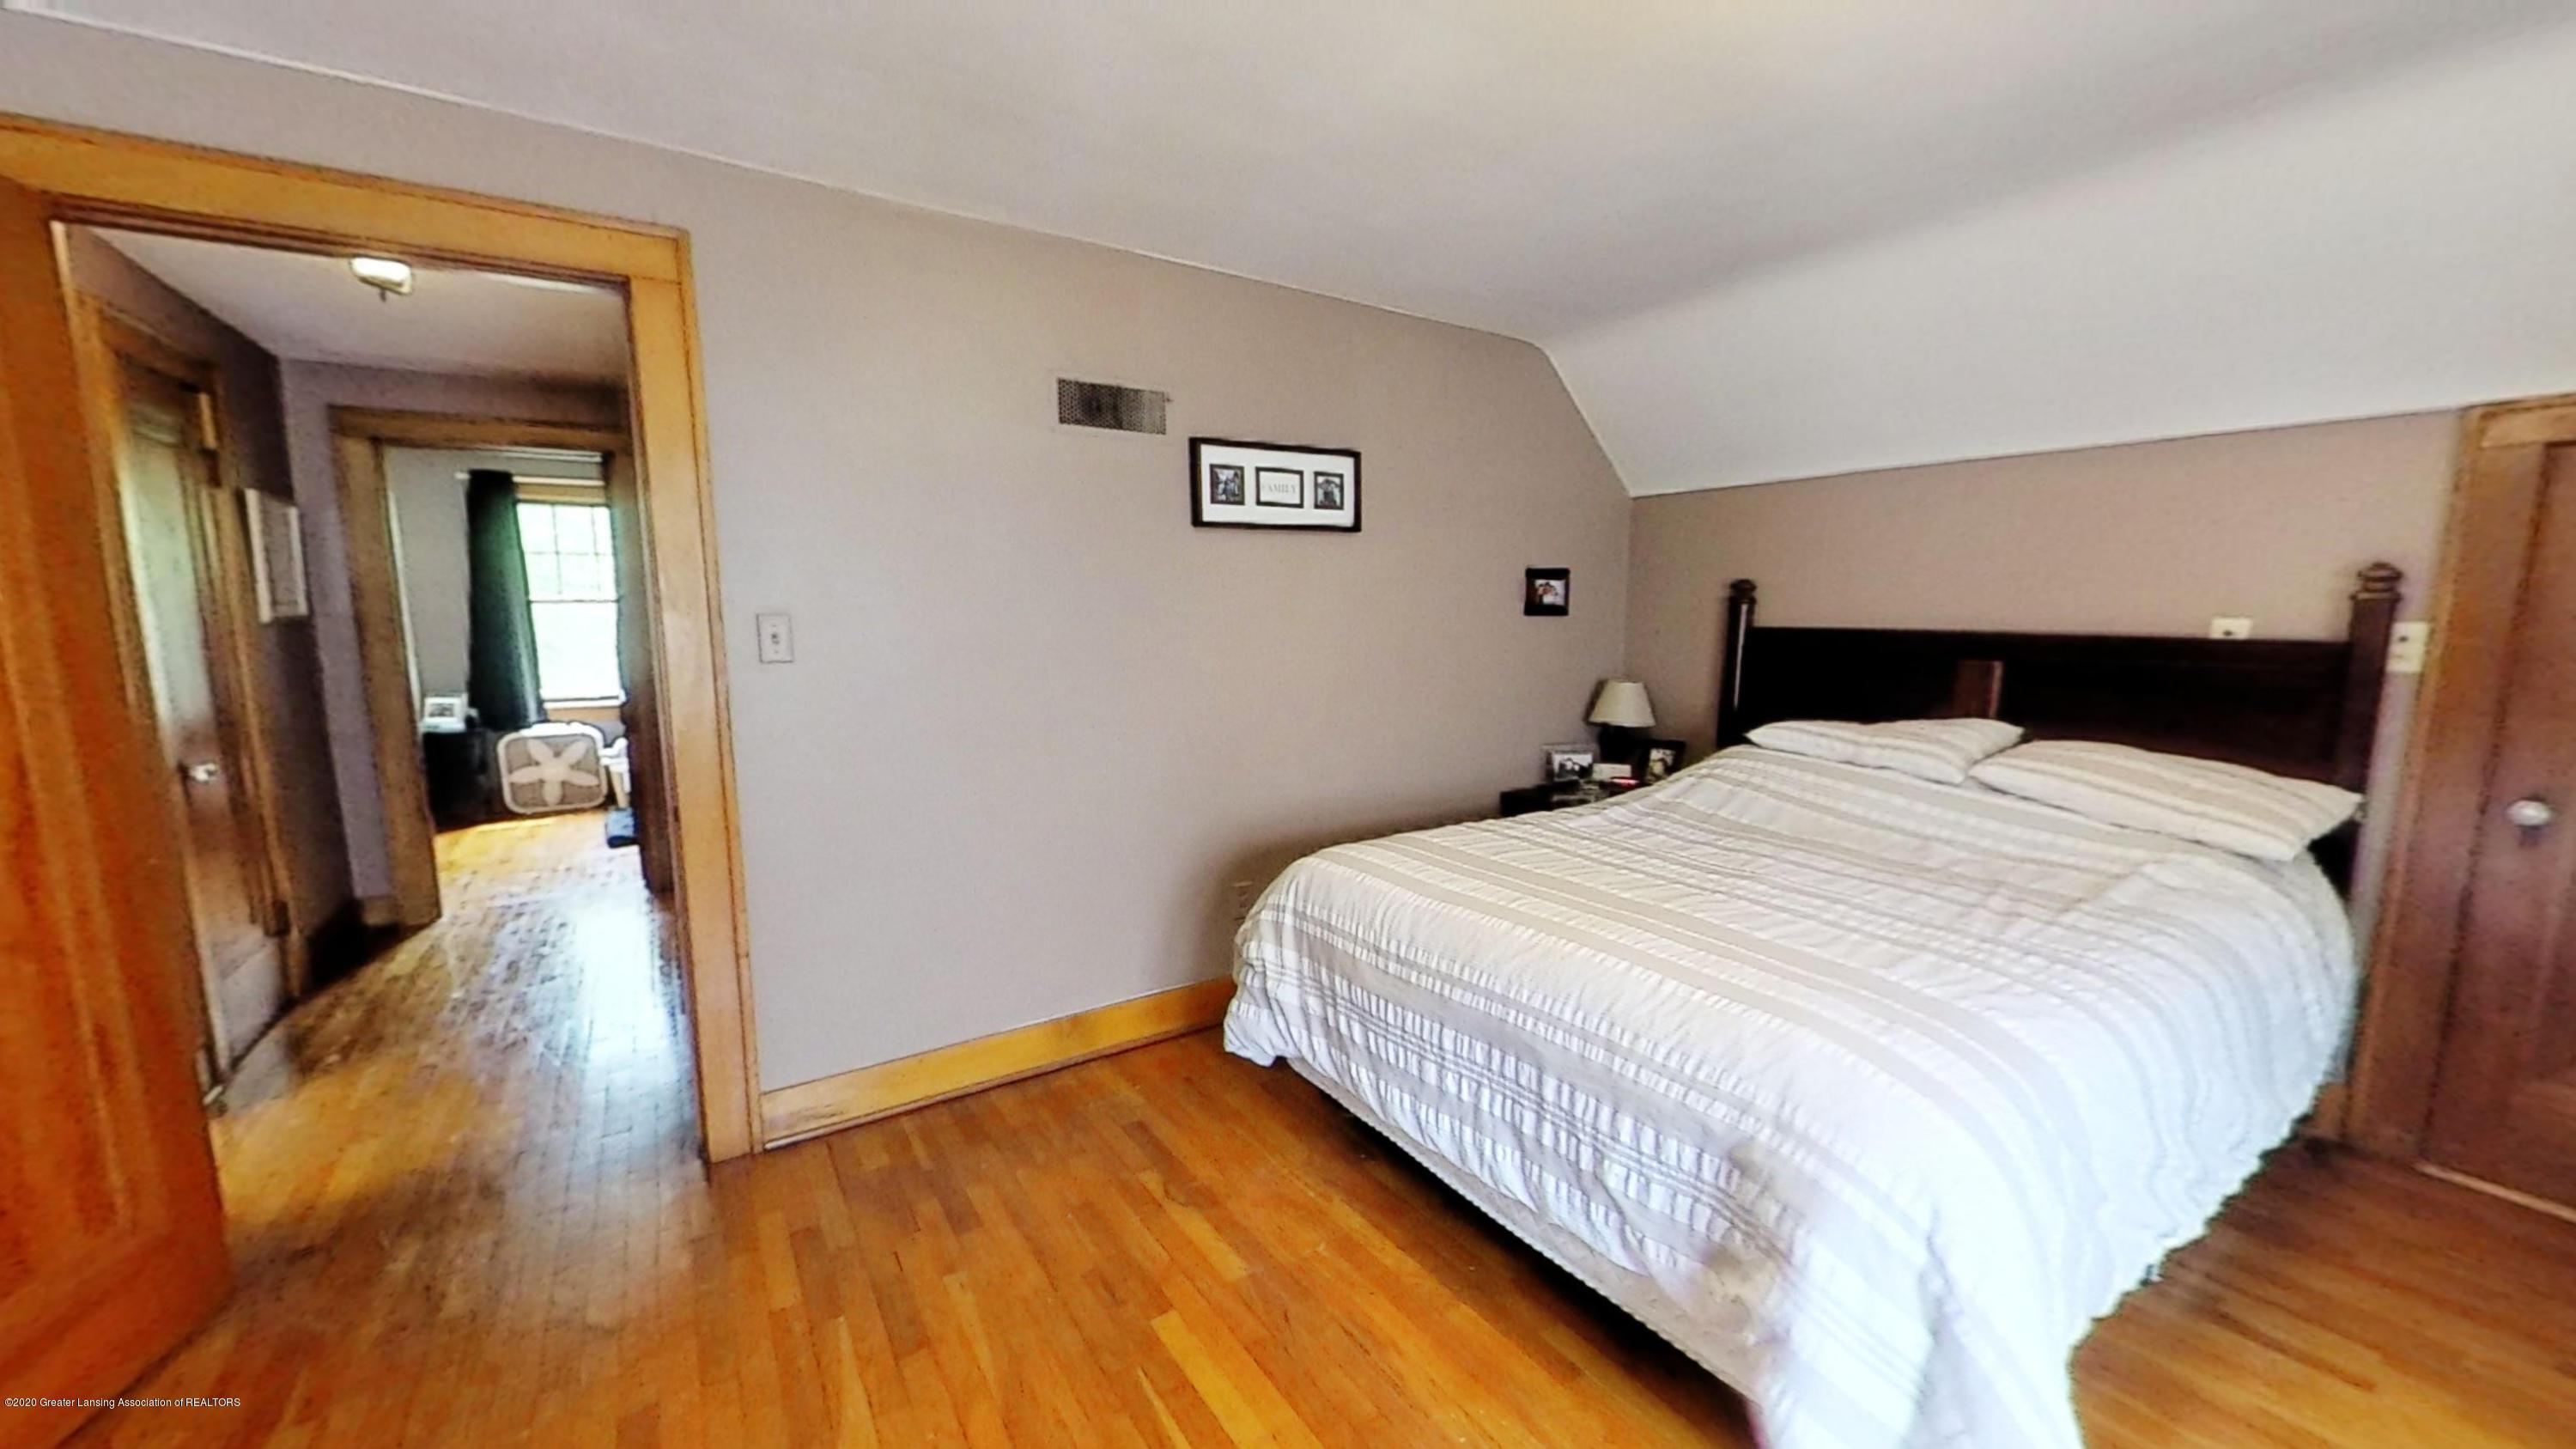 307 S Oakland St - 307-S-Oakland-St-Bedroom(5) - 28